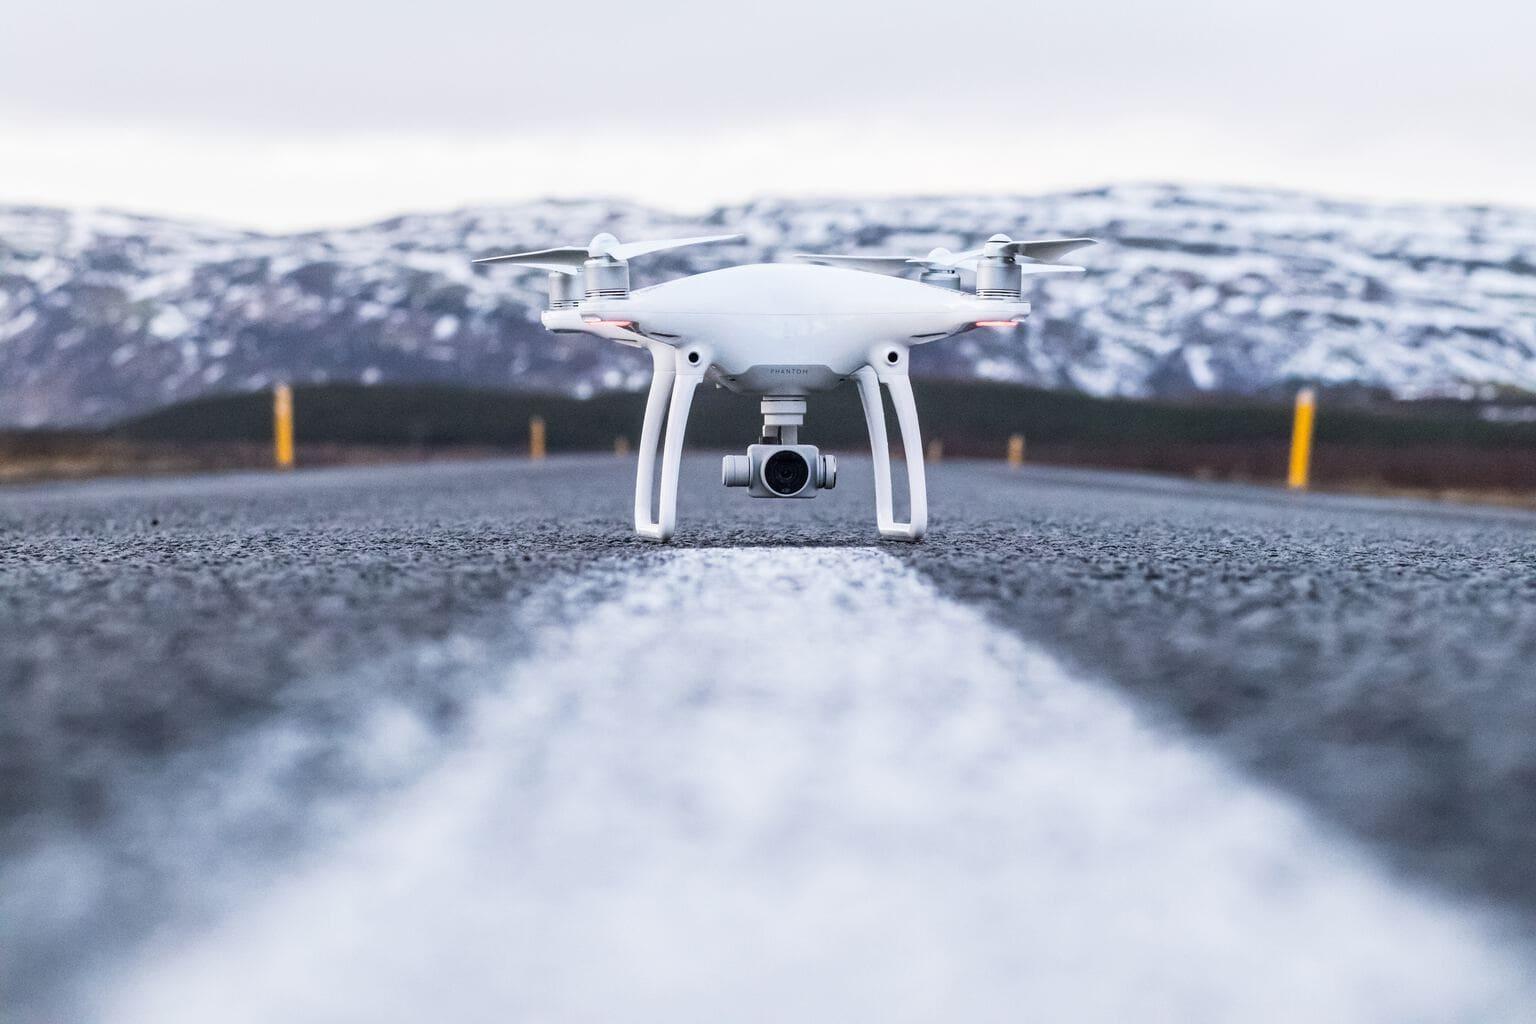 Dron sobre carretera con montaña nevada al fondo